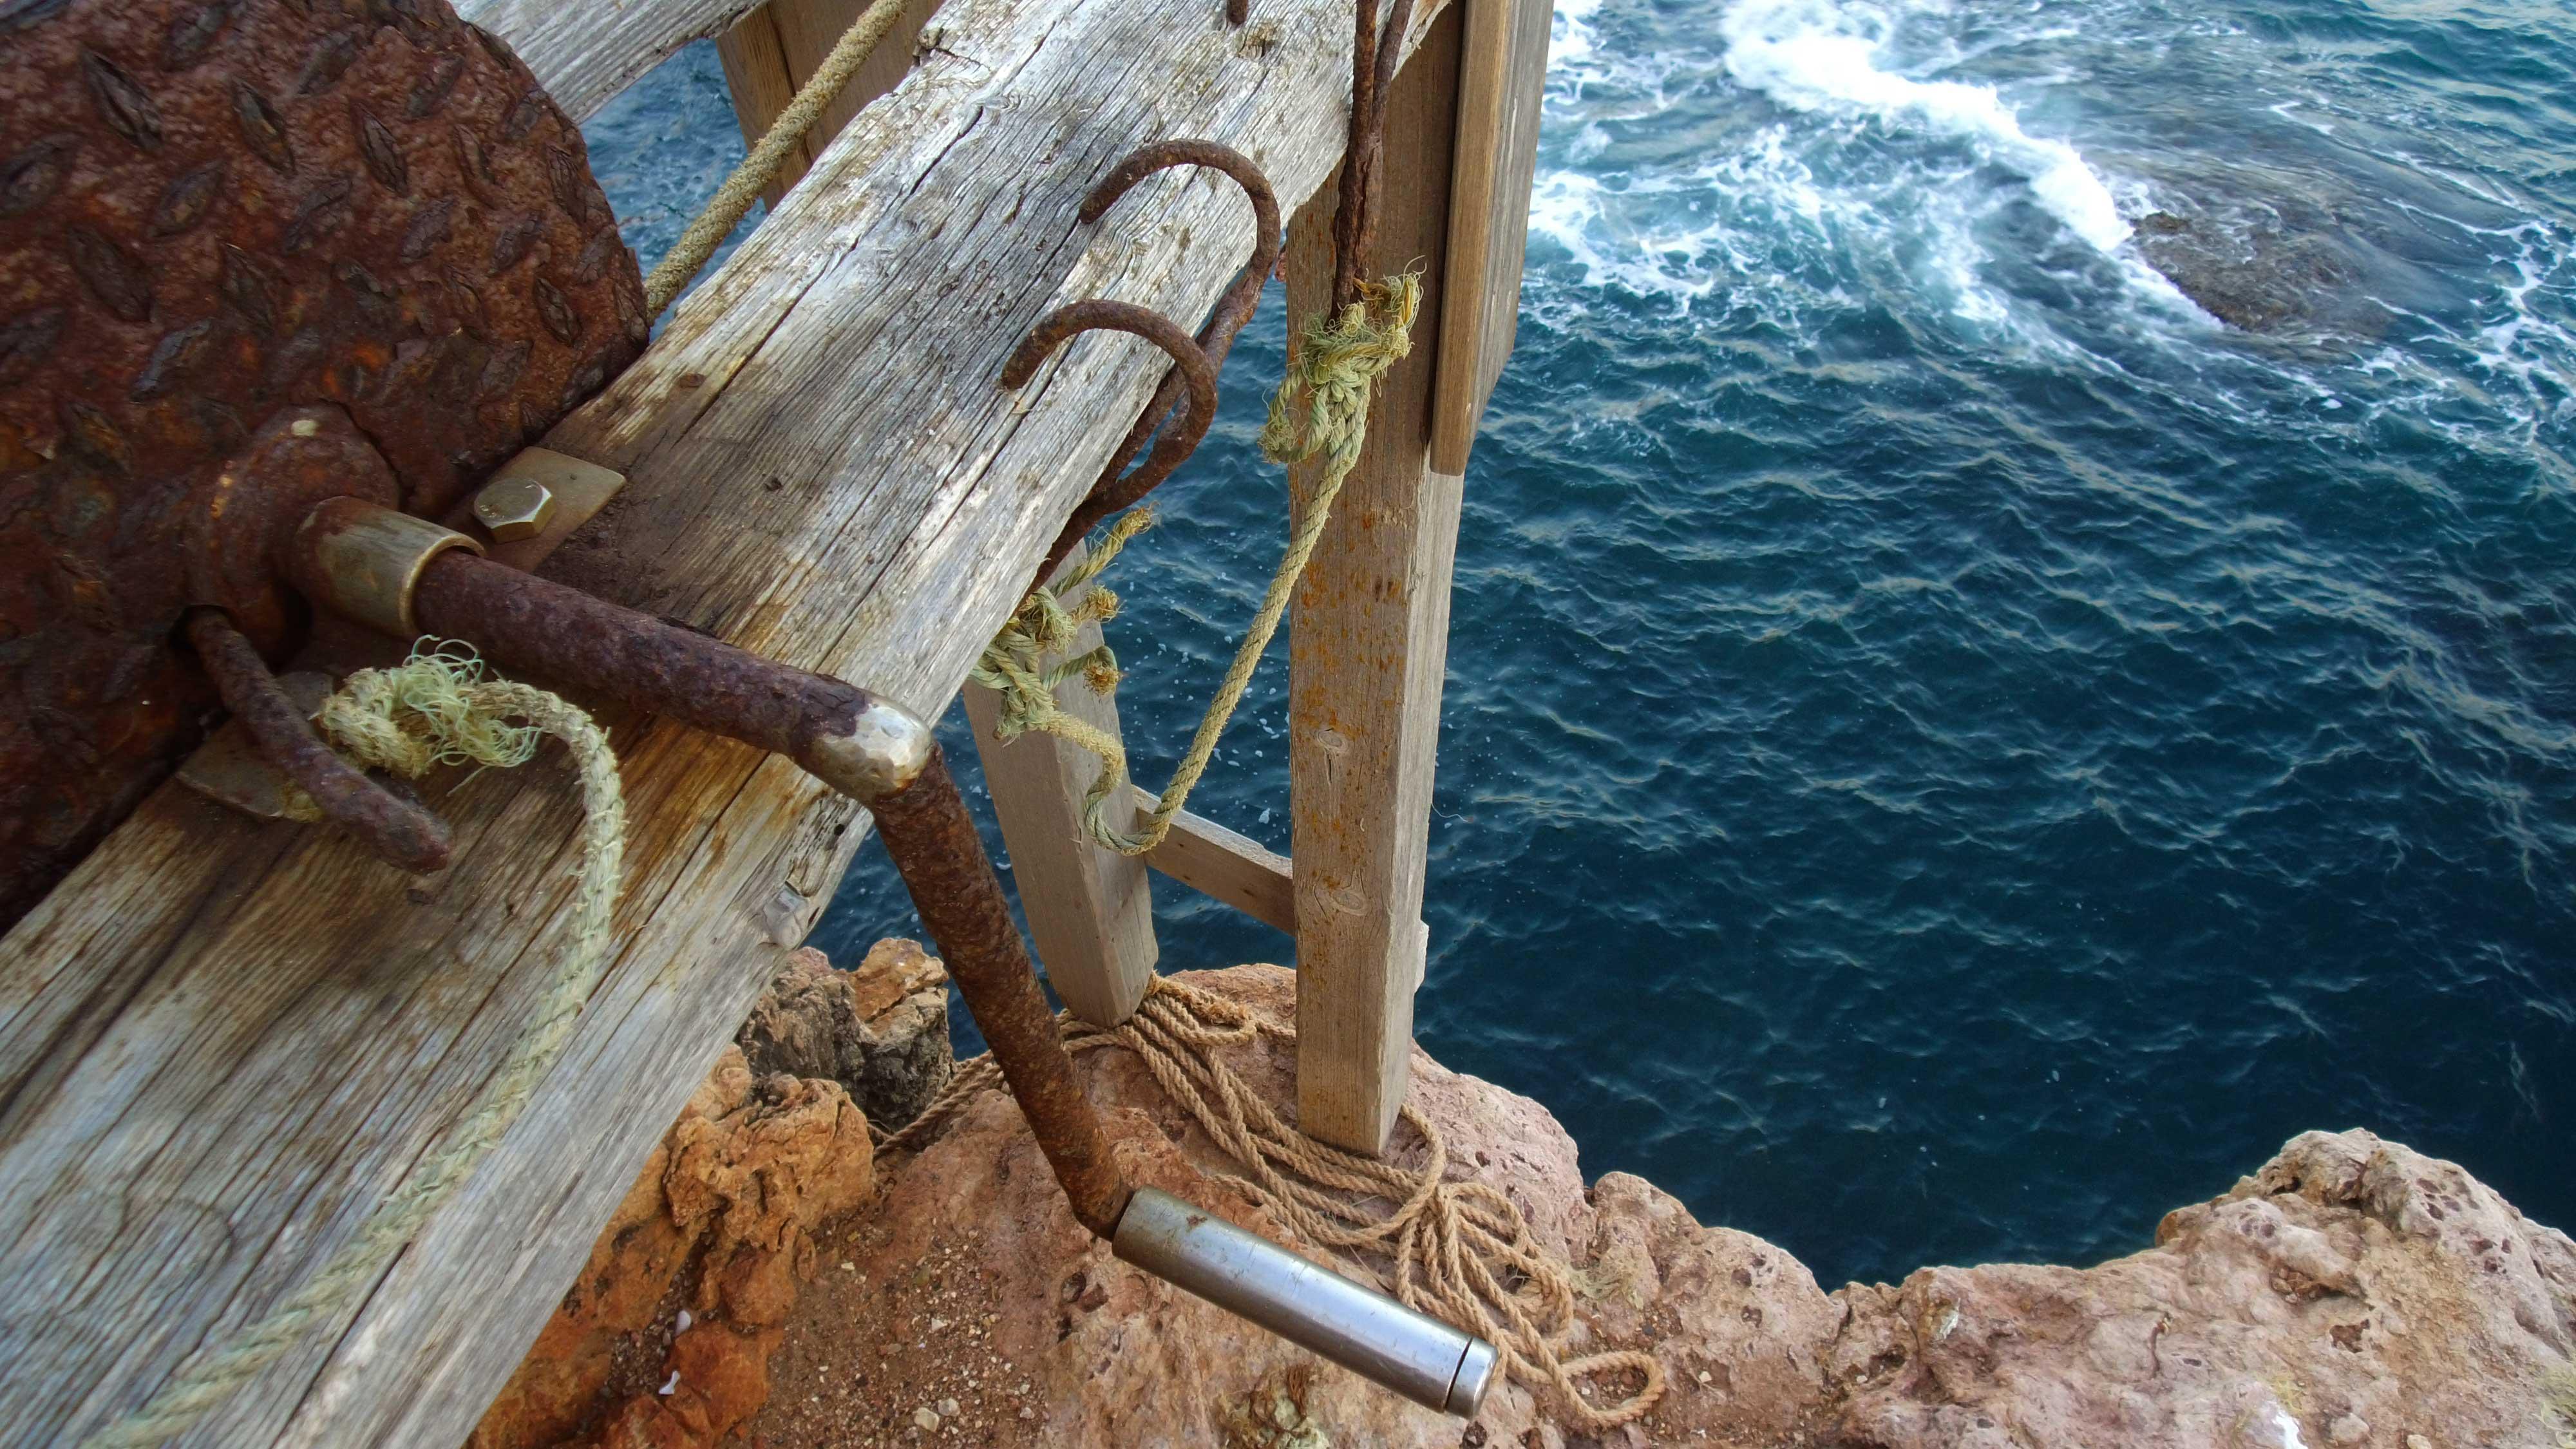 Carrapateira,-utenssílios-de-pesca